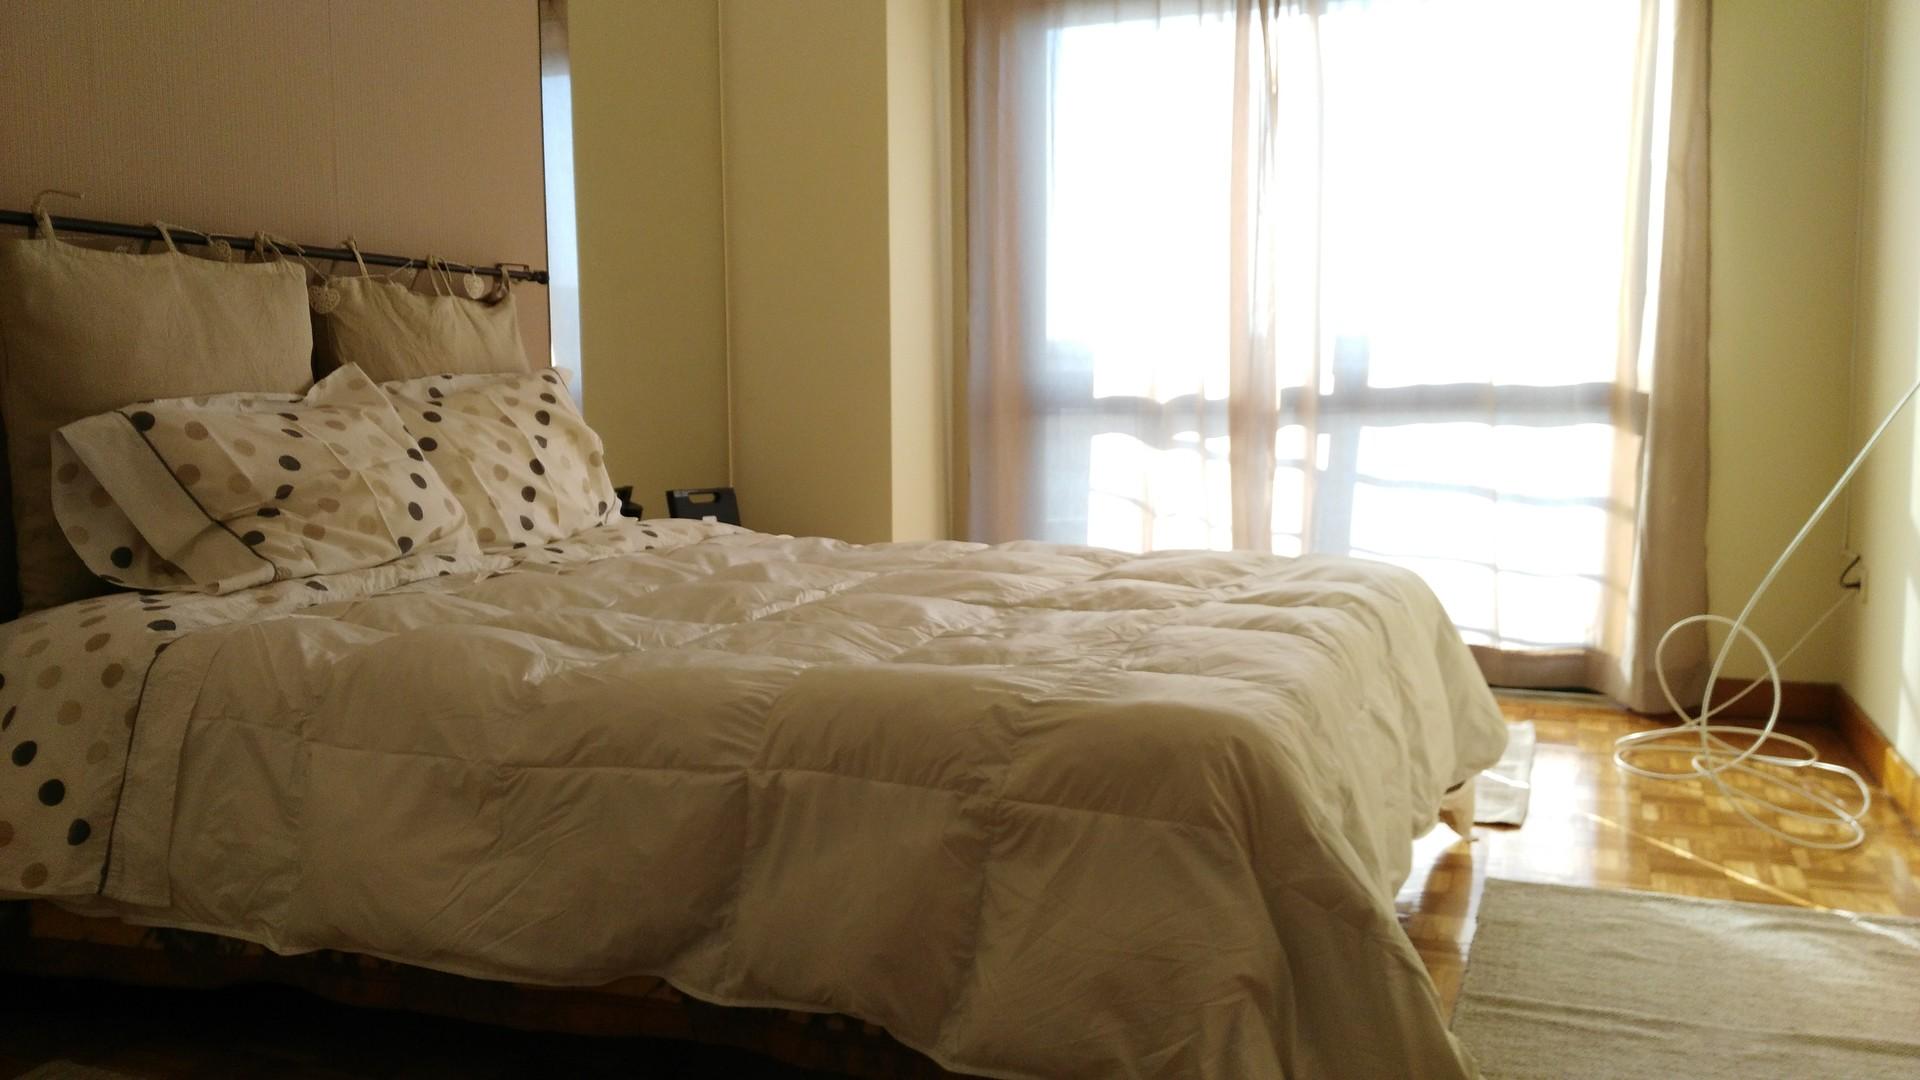 rooms-apartment-t1-rent-braga-5-minutes-uminho-inl-0bfdf5b3b36da309c6866491cfdfece5